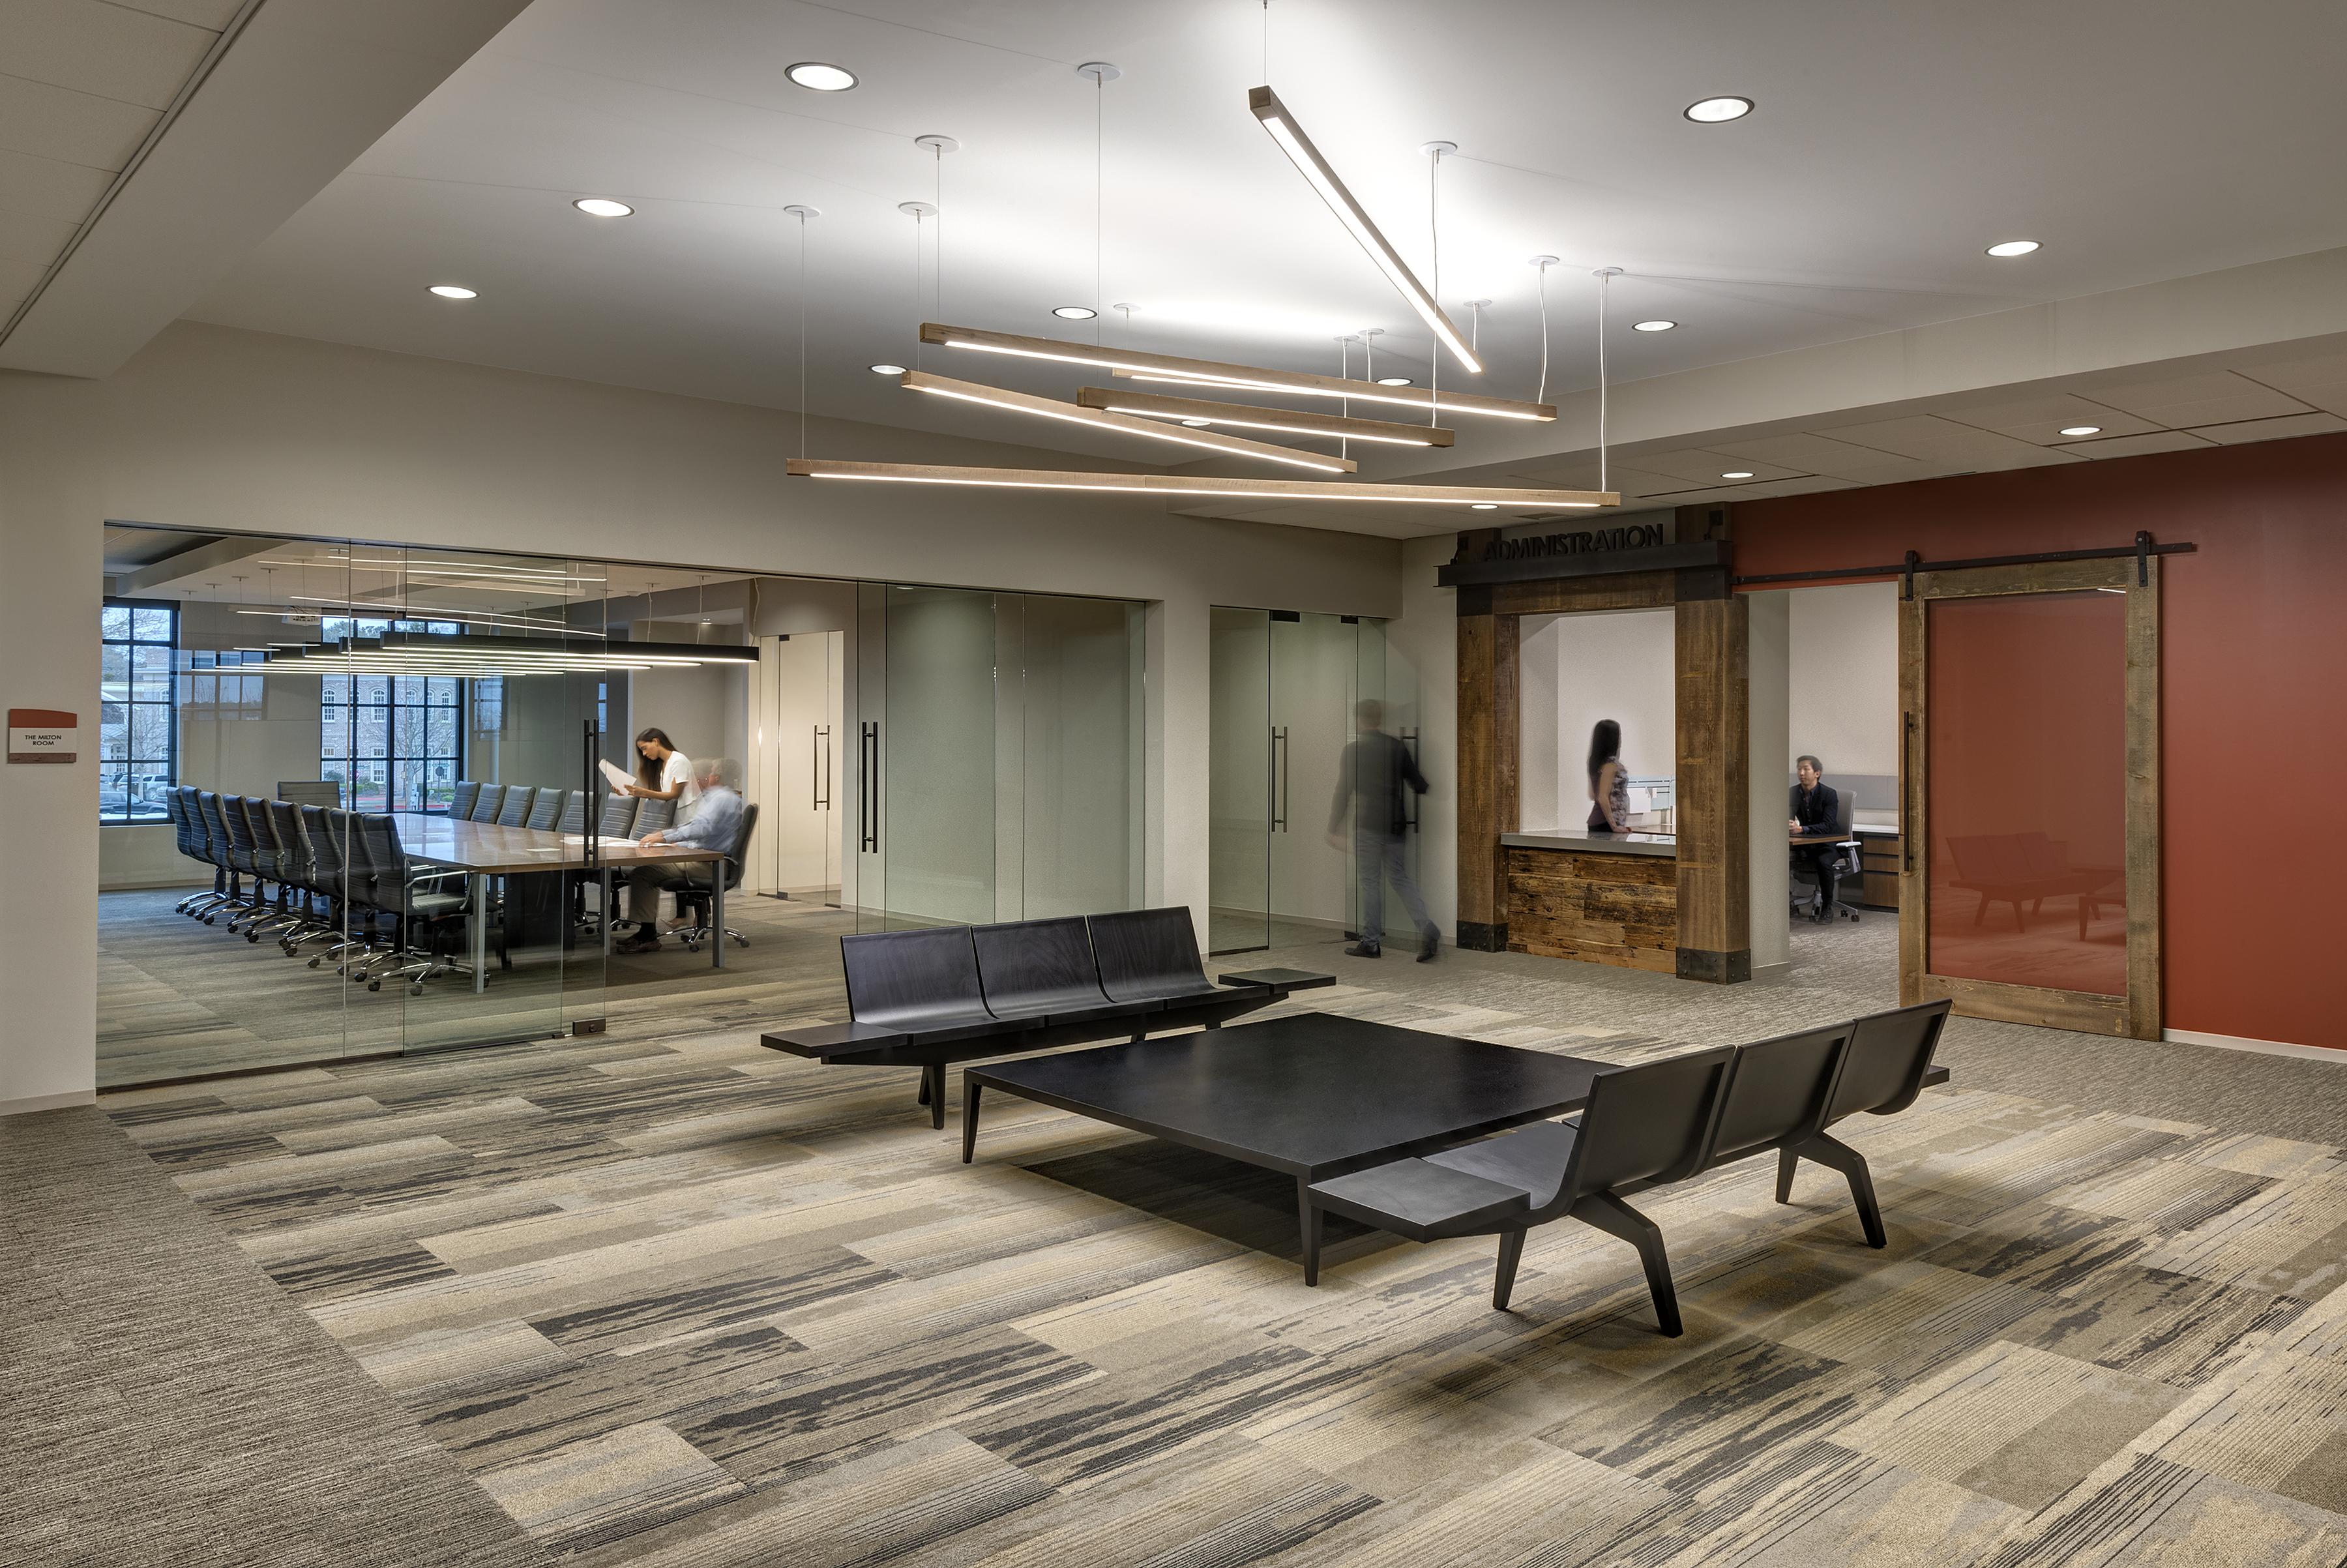 A look inside the brand new Milton City Hall north of Atlanta.